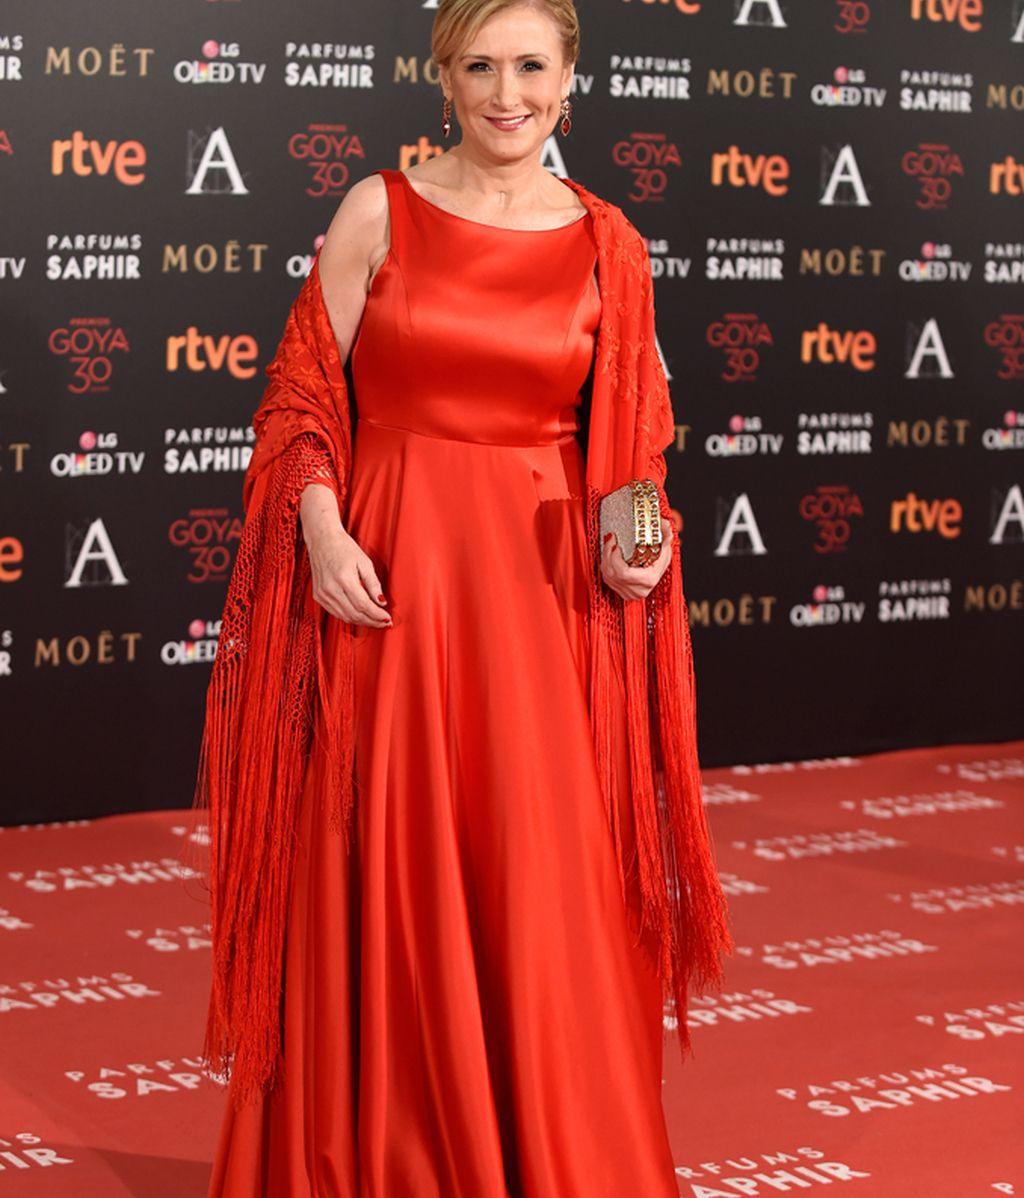 Cristina Cifuentes en la alfombra roja de los Goya